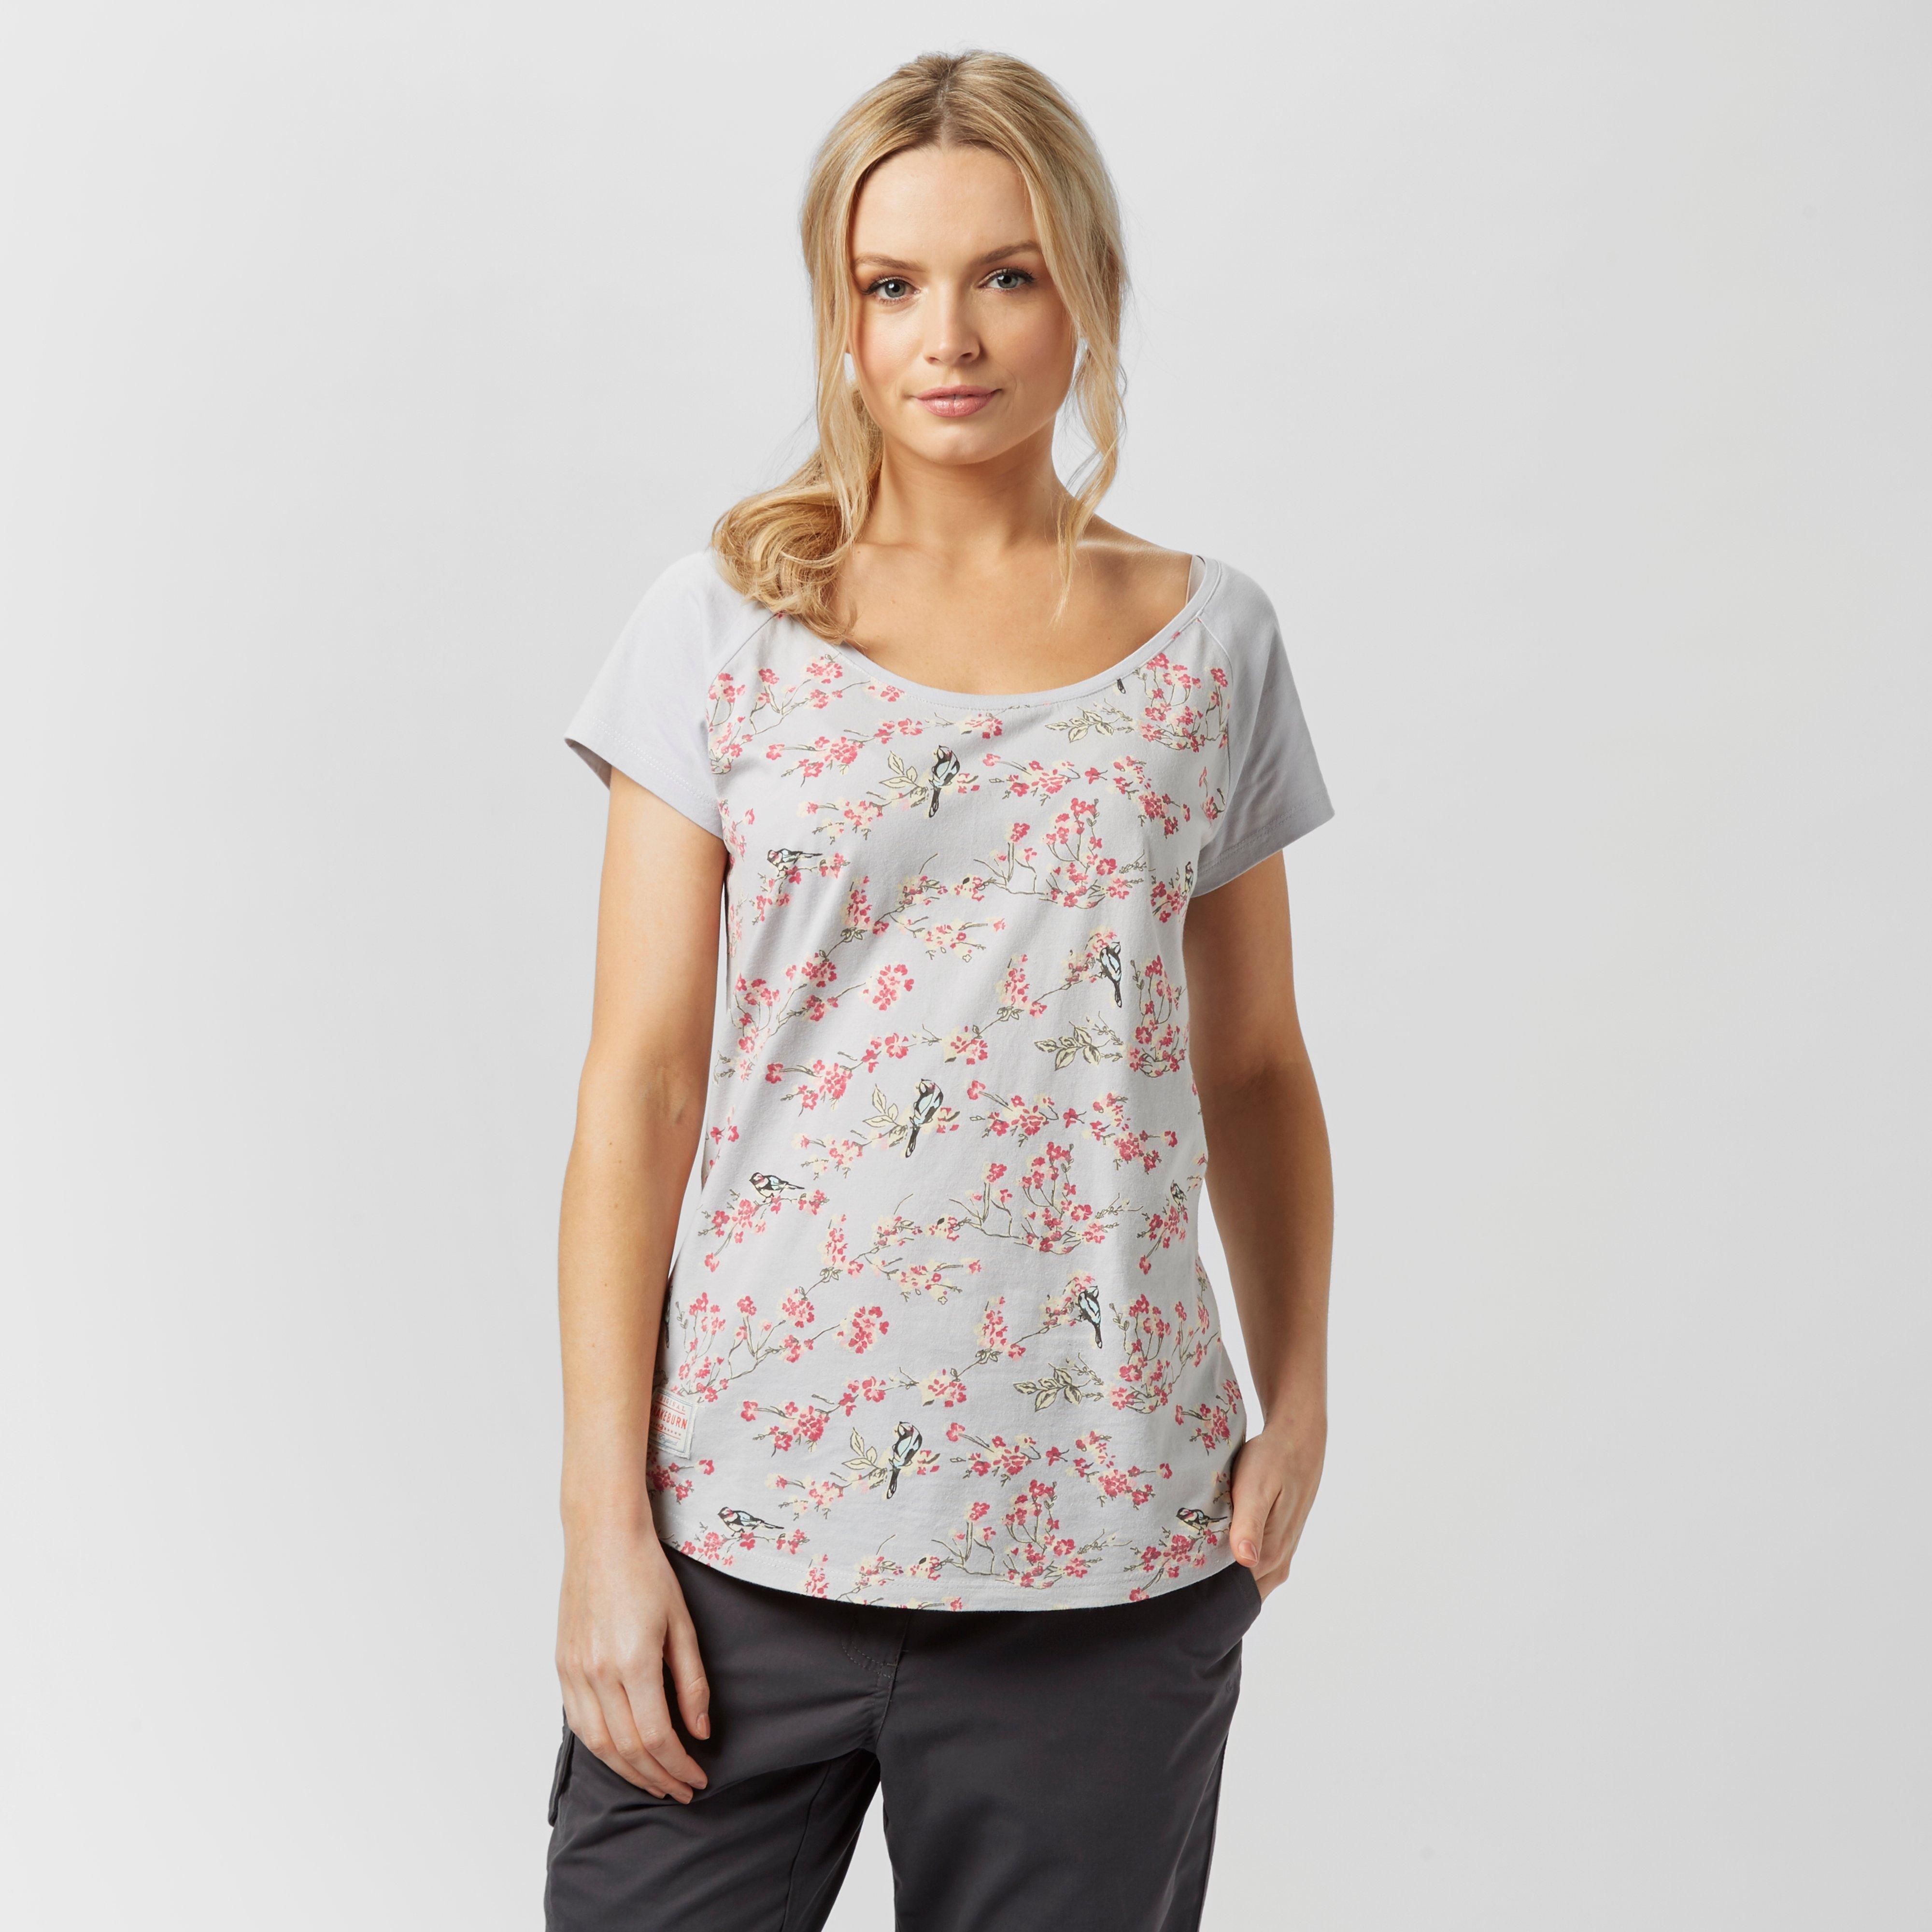 Brakeburn Womens Bird T-shirt - Mgy/mgy  Mgy/mgy